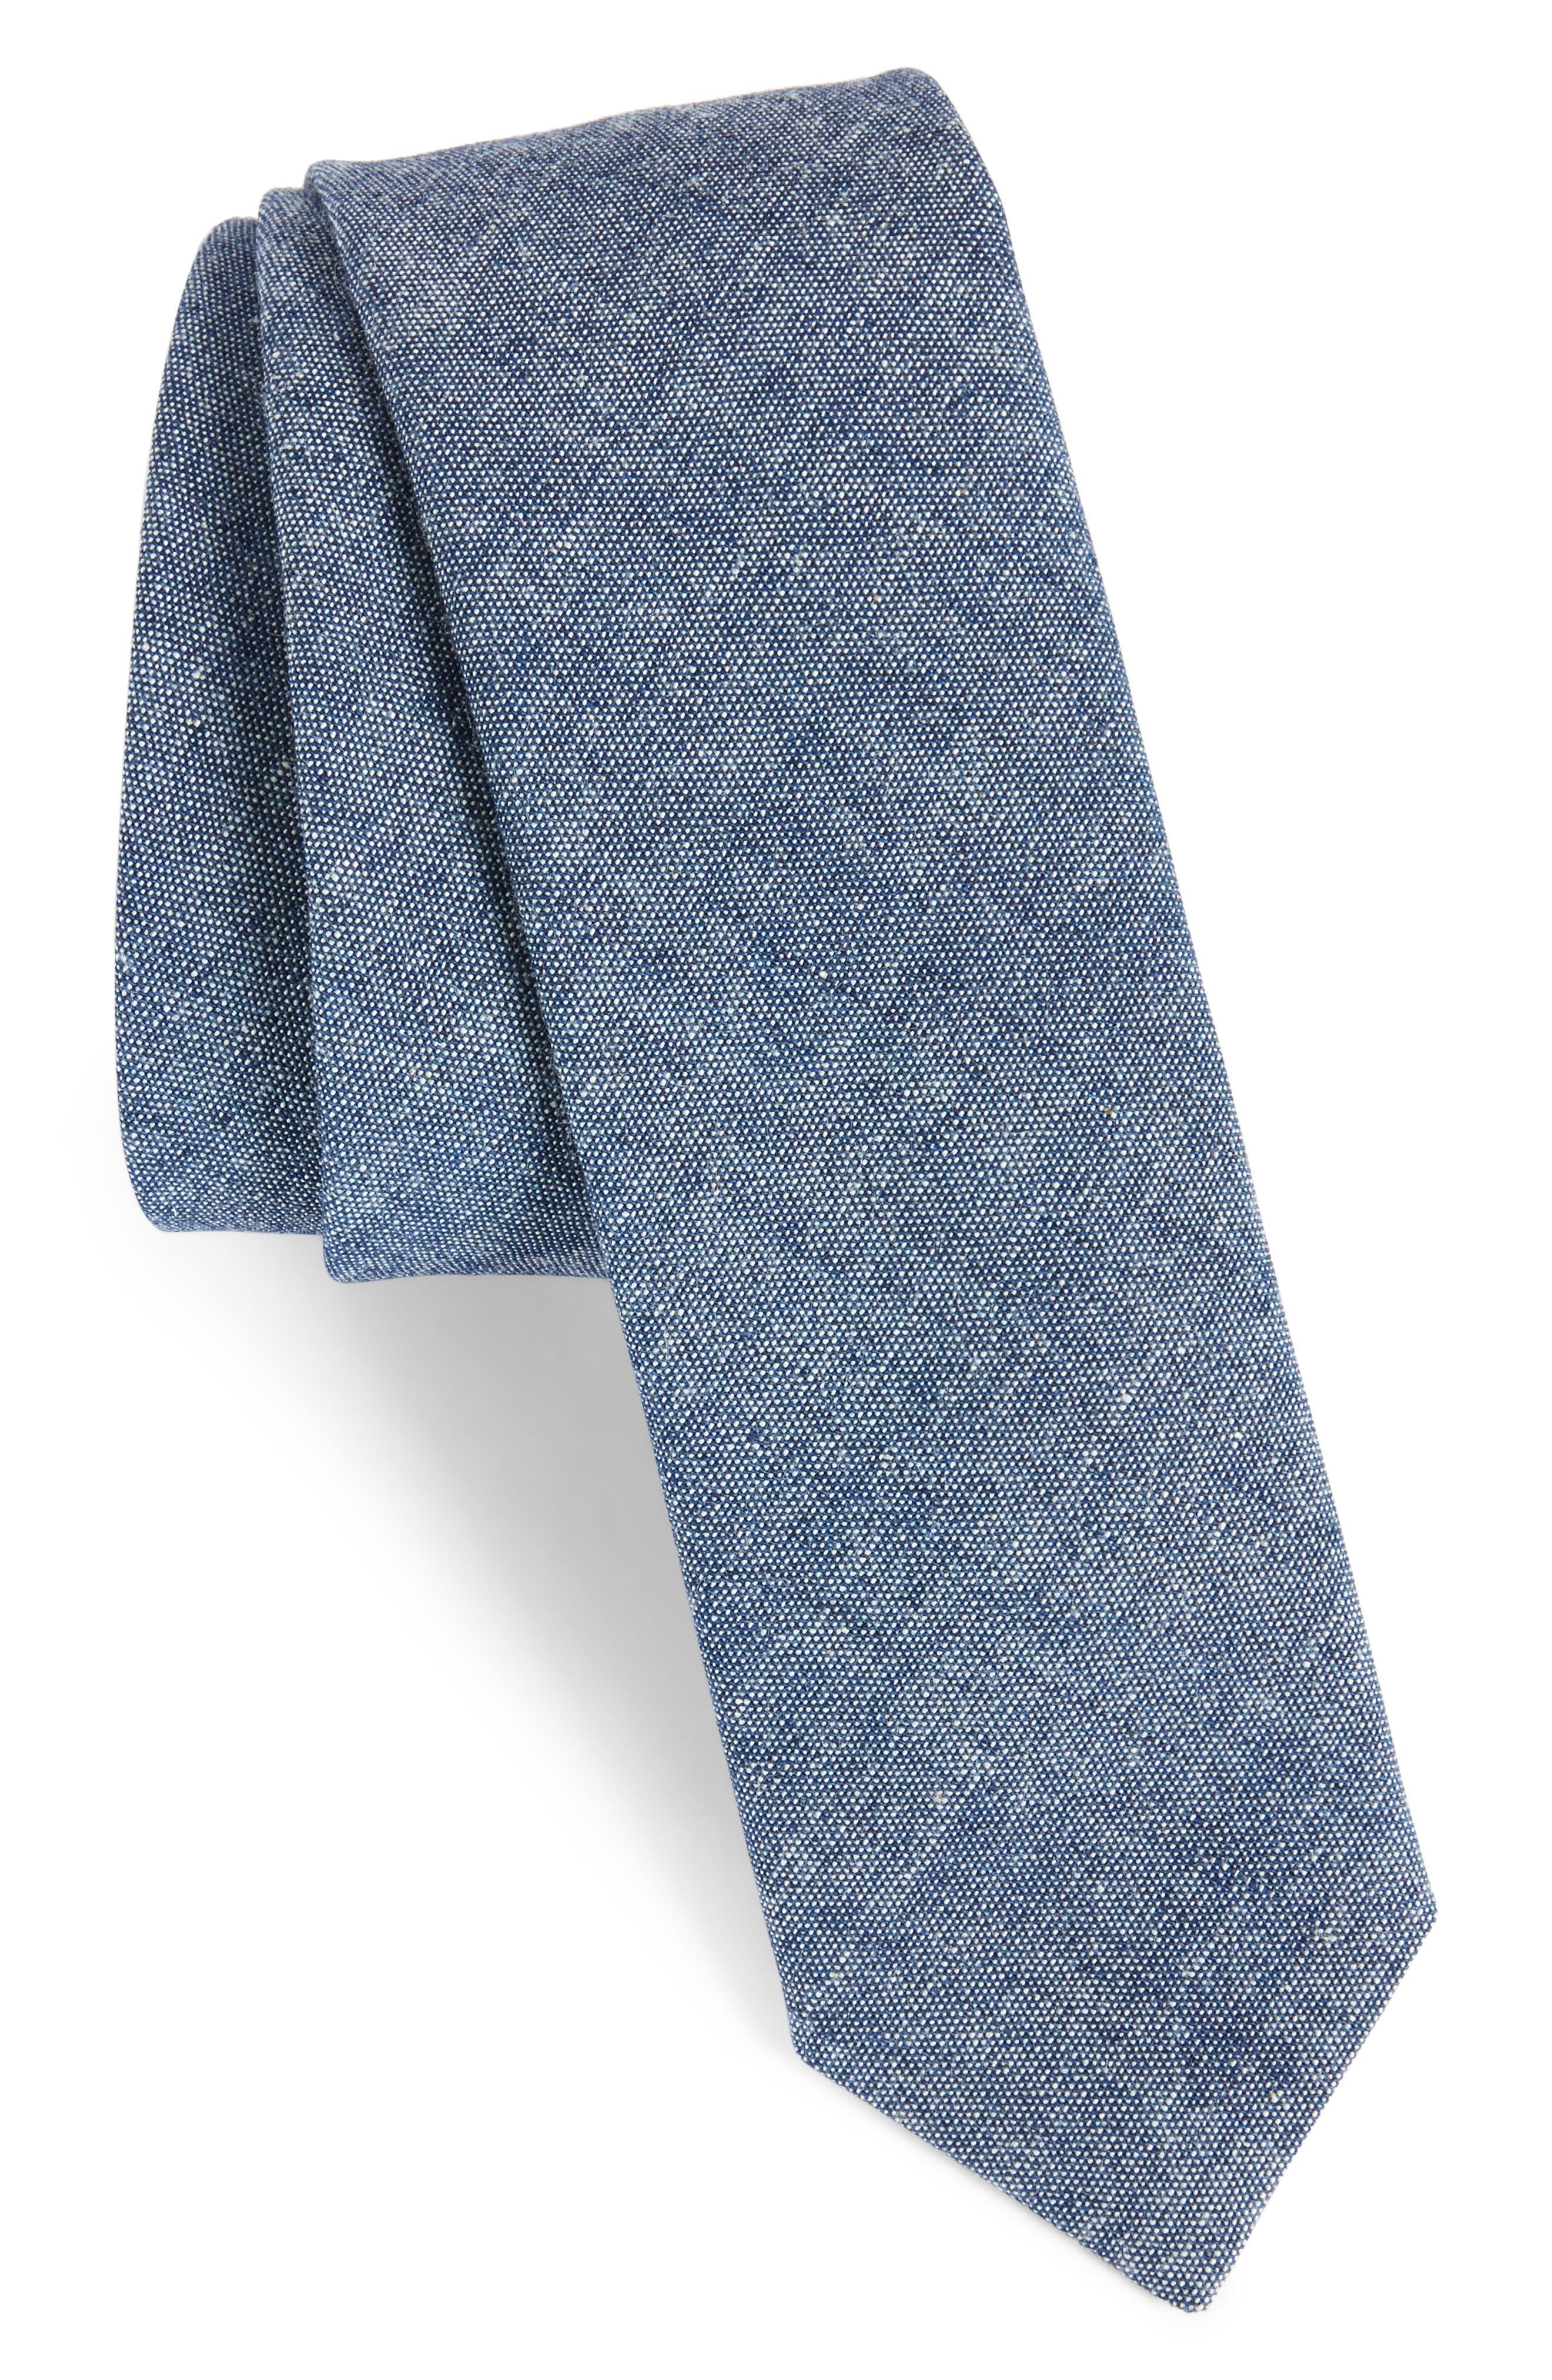 Alternate Image 1 Selected - Eleventy Marled Cotton Skinny Tie